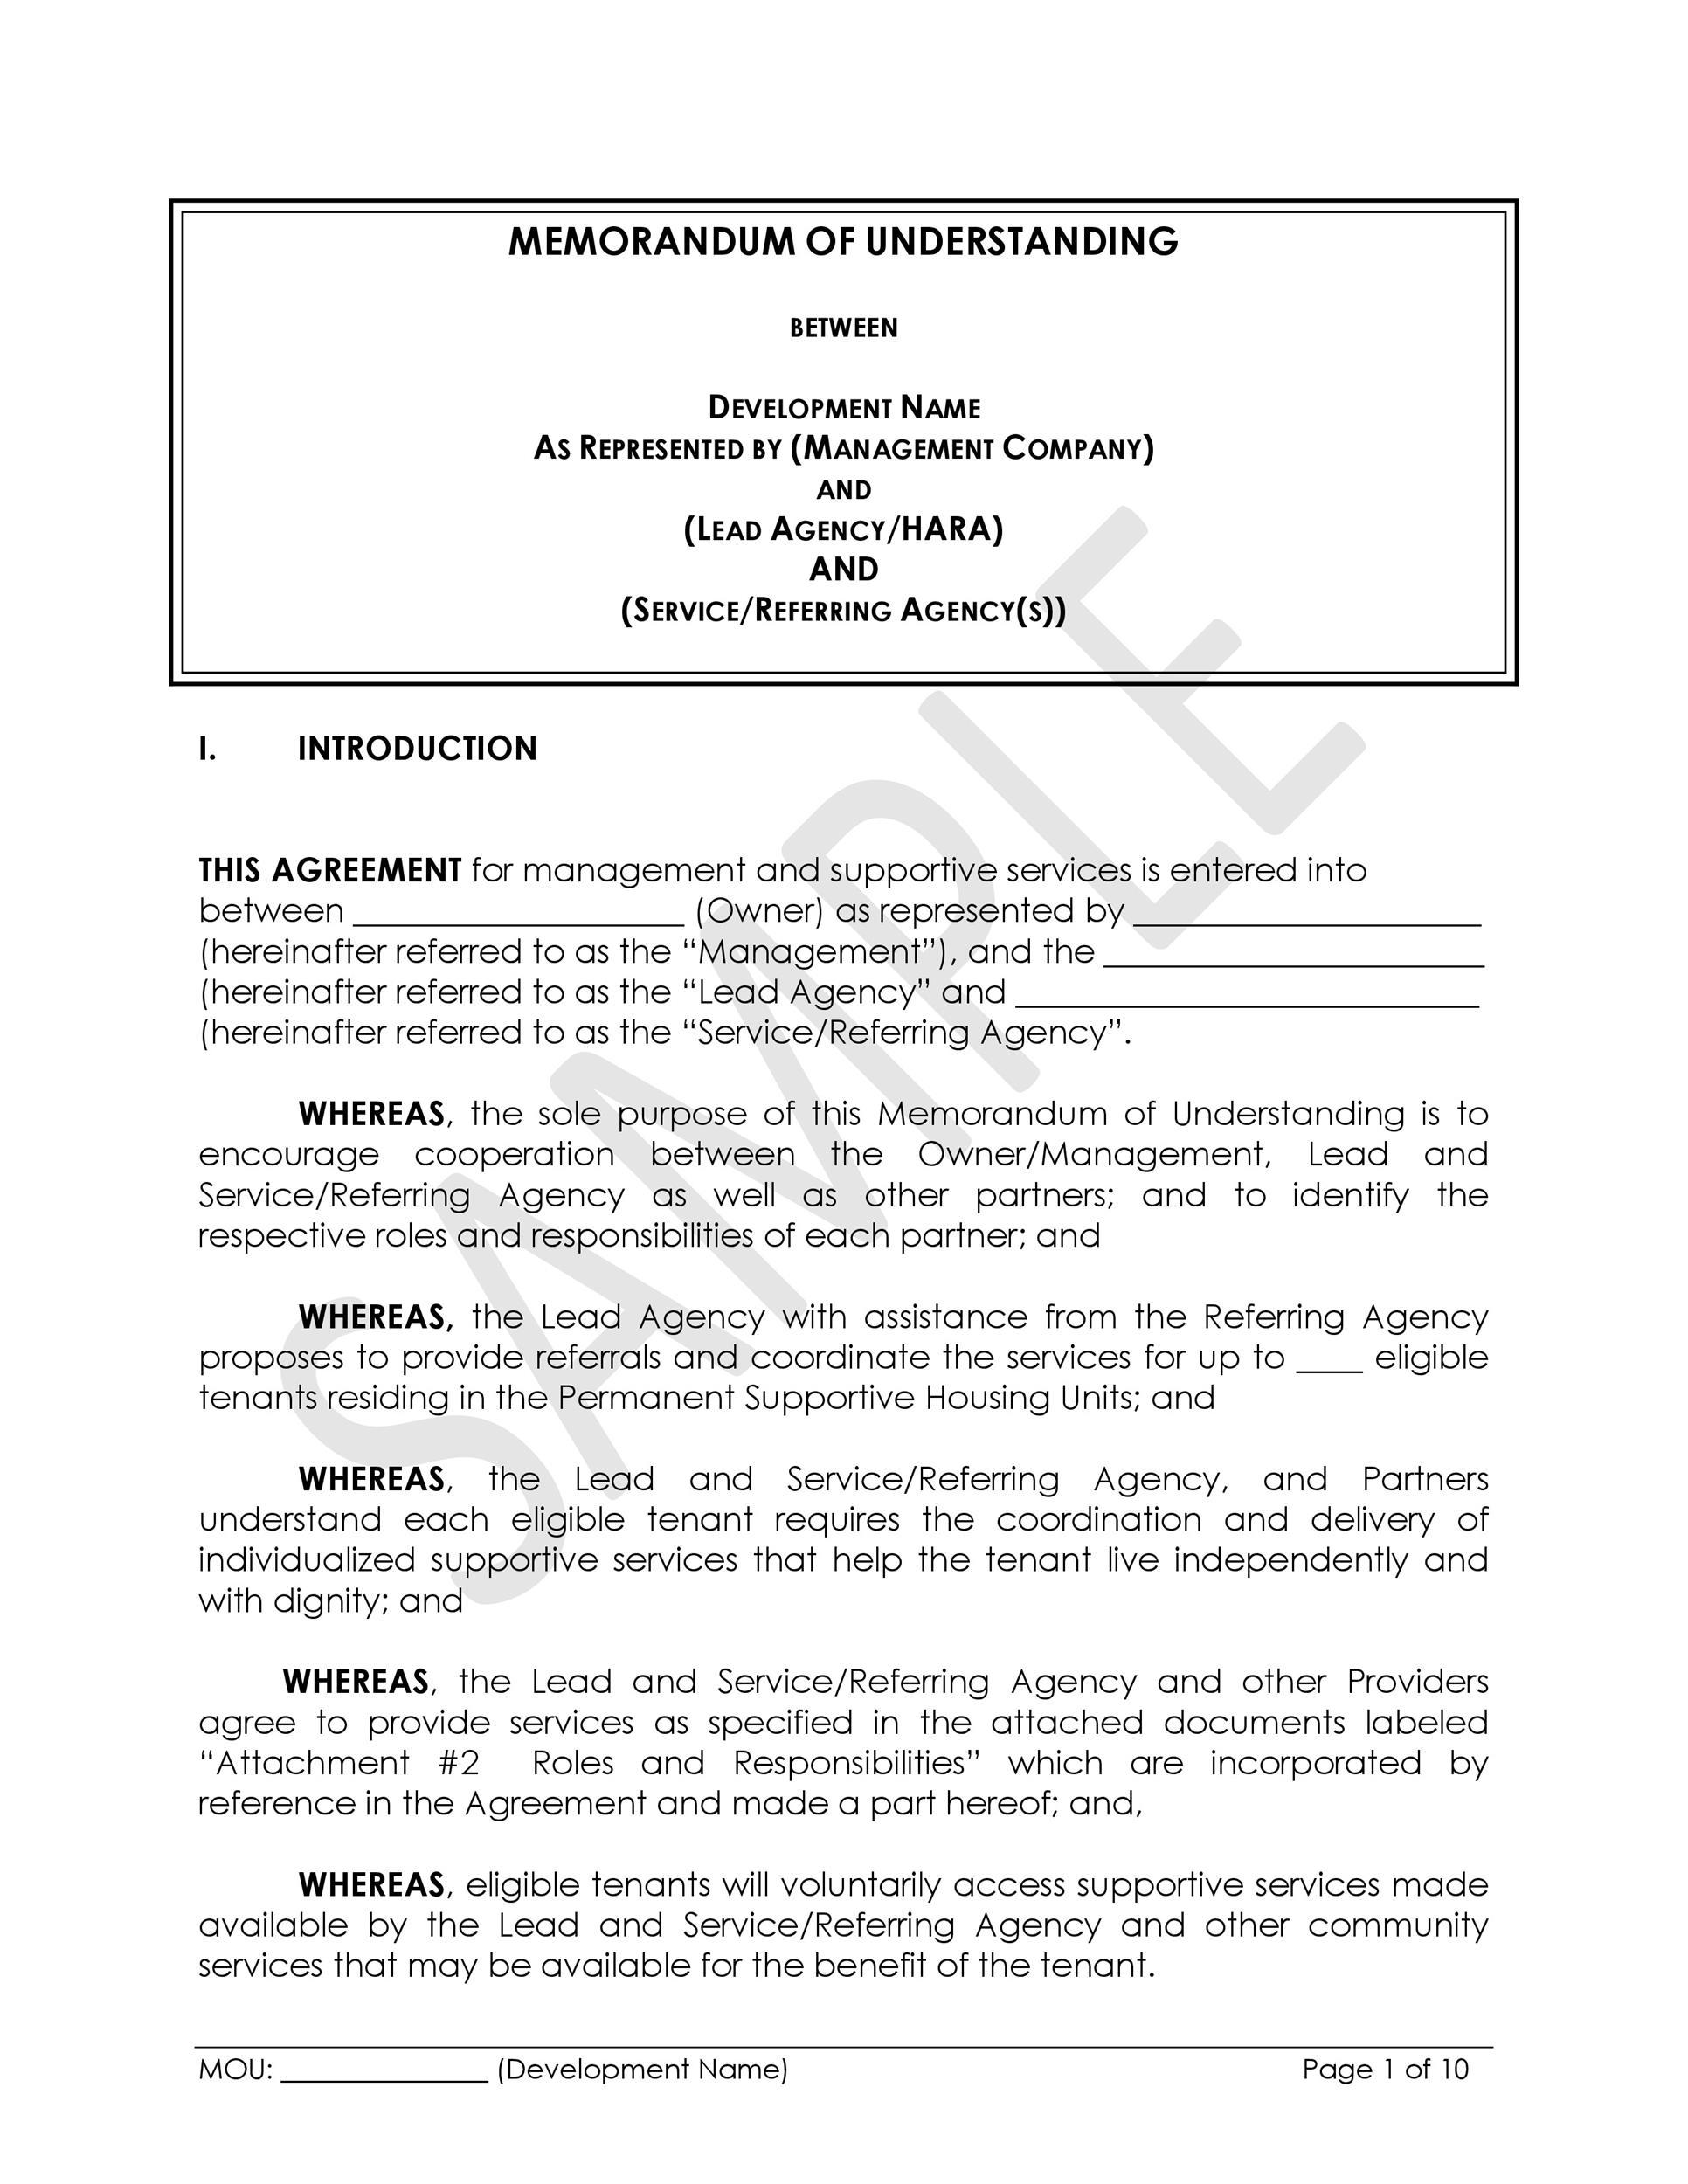 Free Memorandum of Understanding Template 03